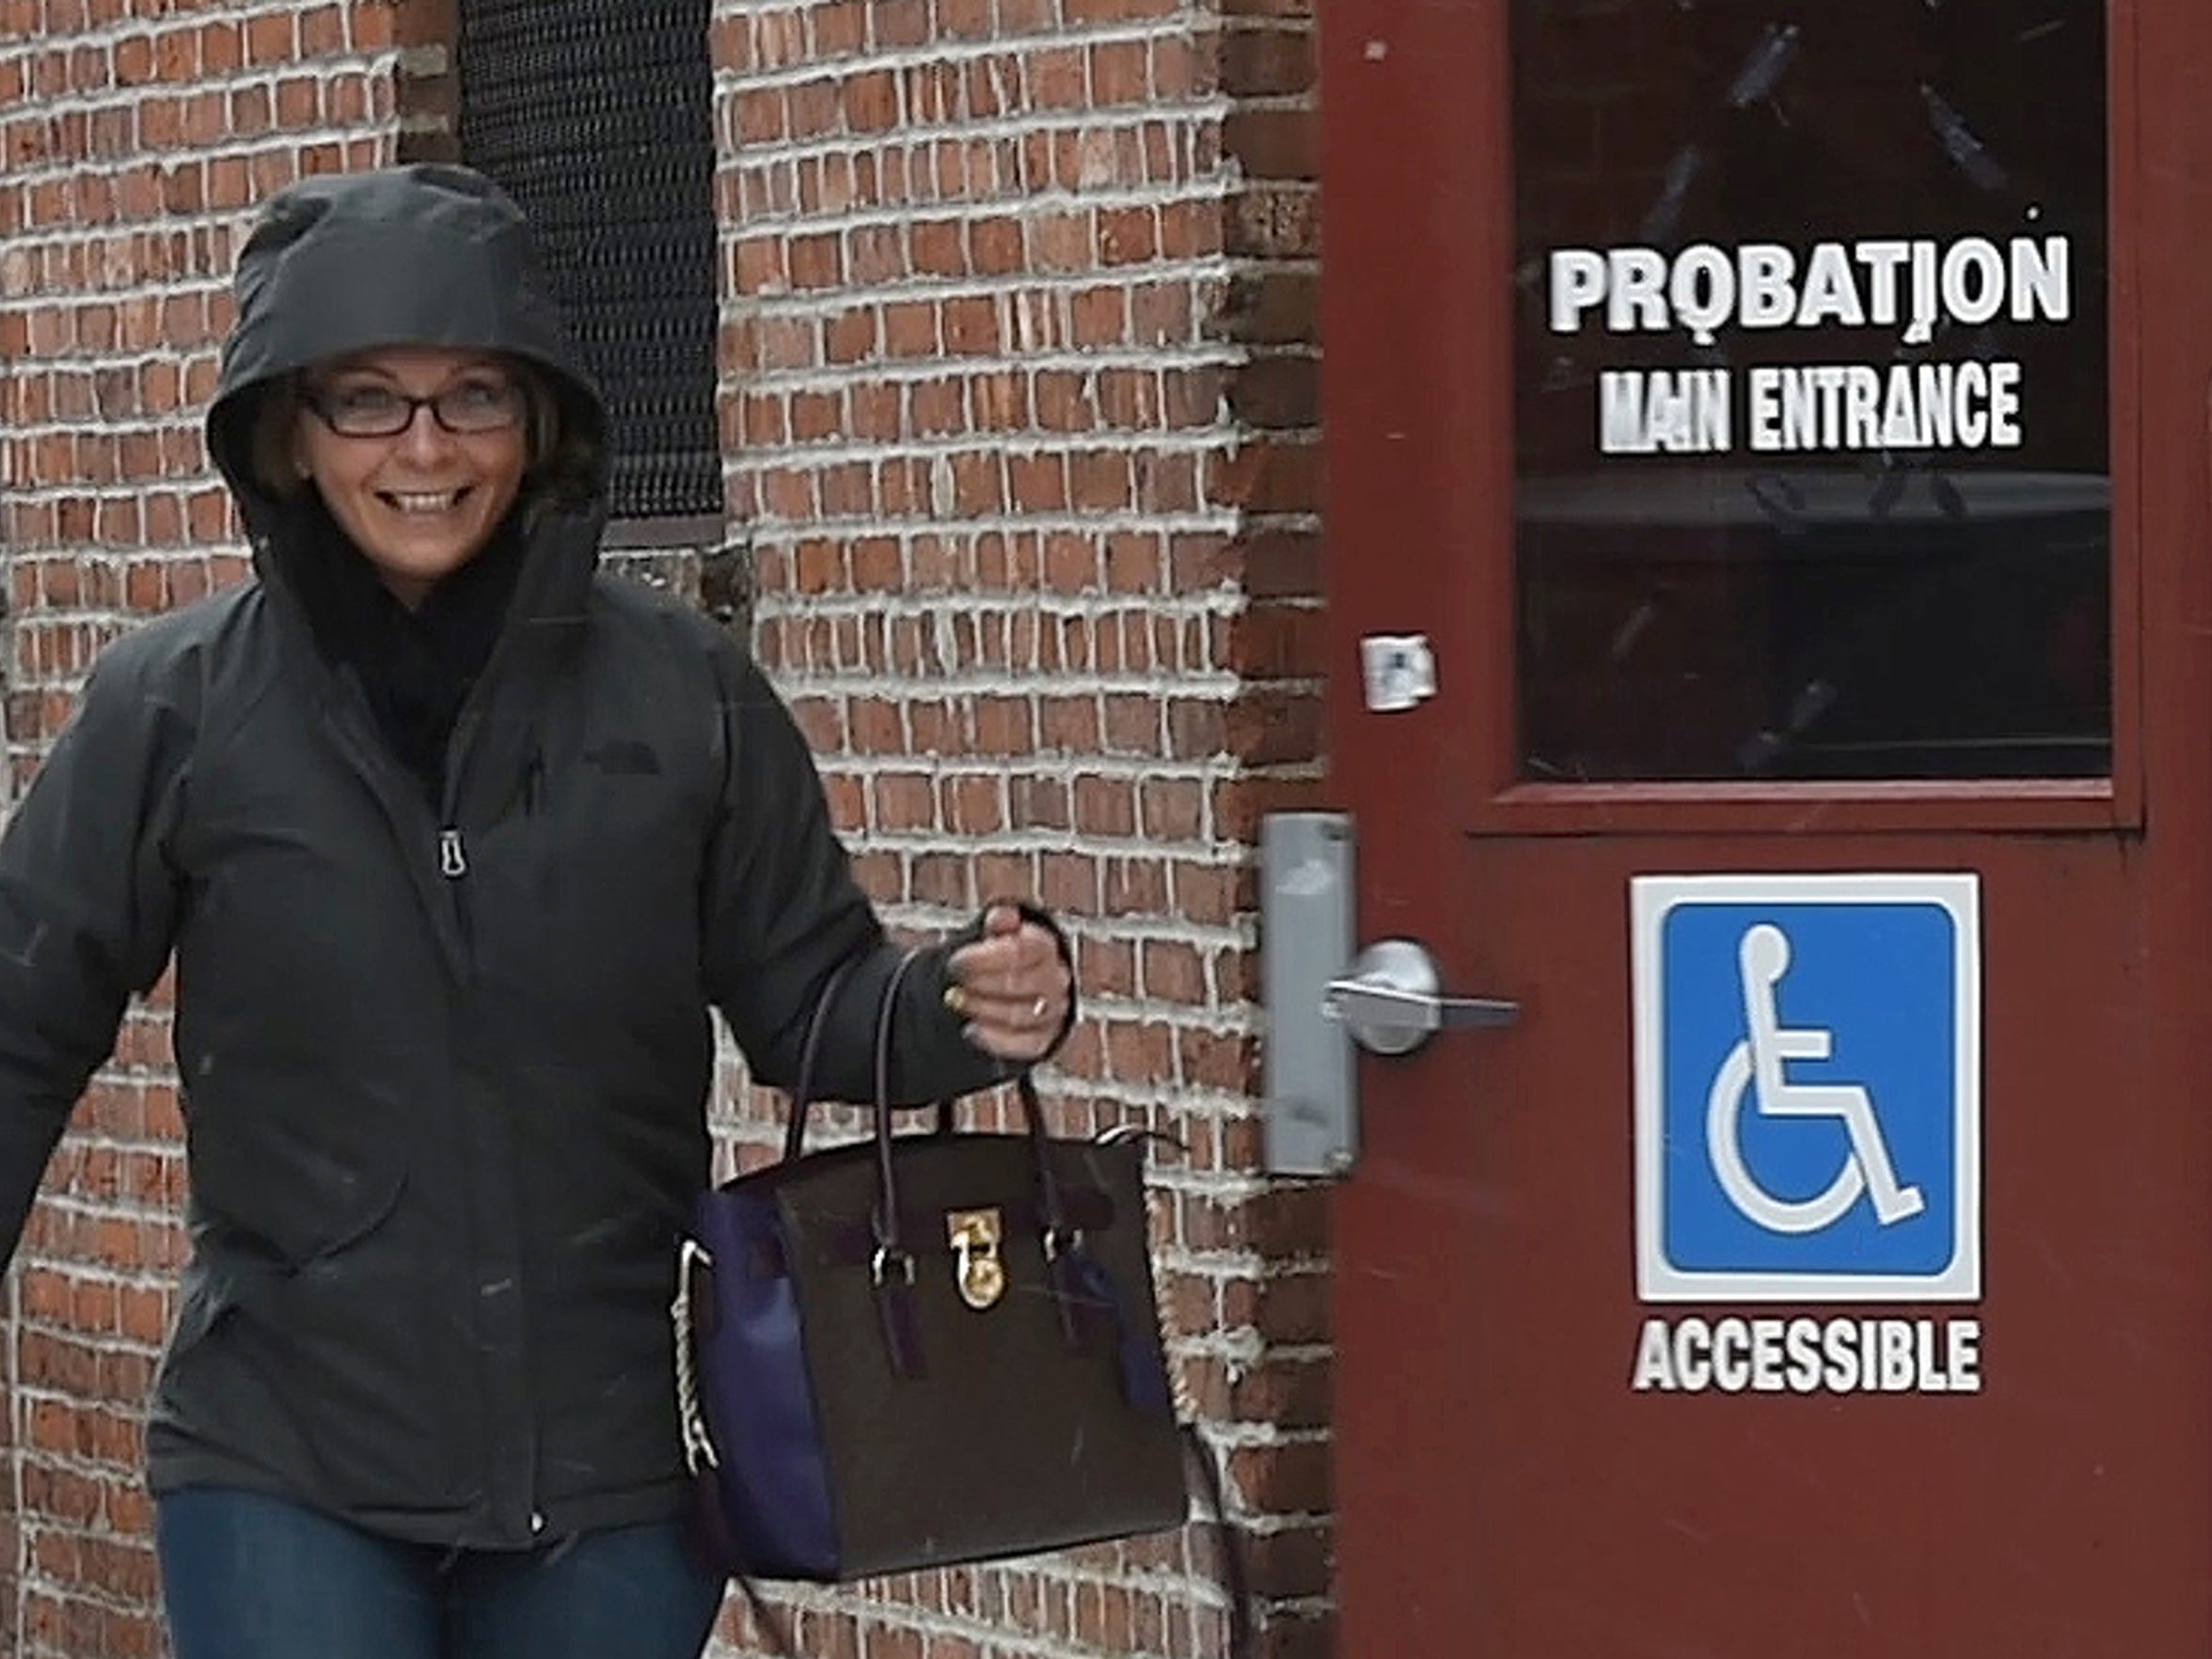 Amanda Zita leaves the Passaic County Probation Office